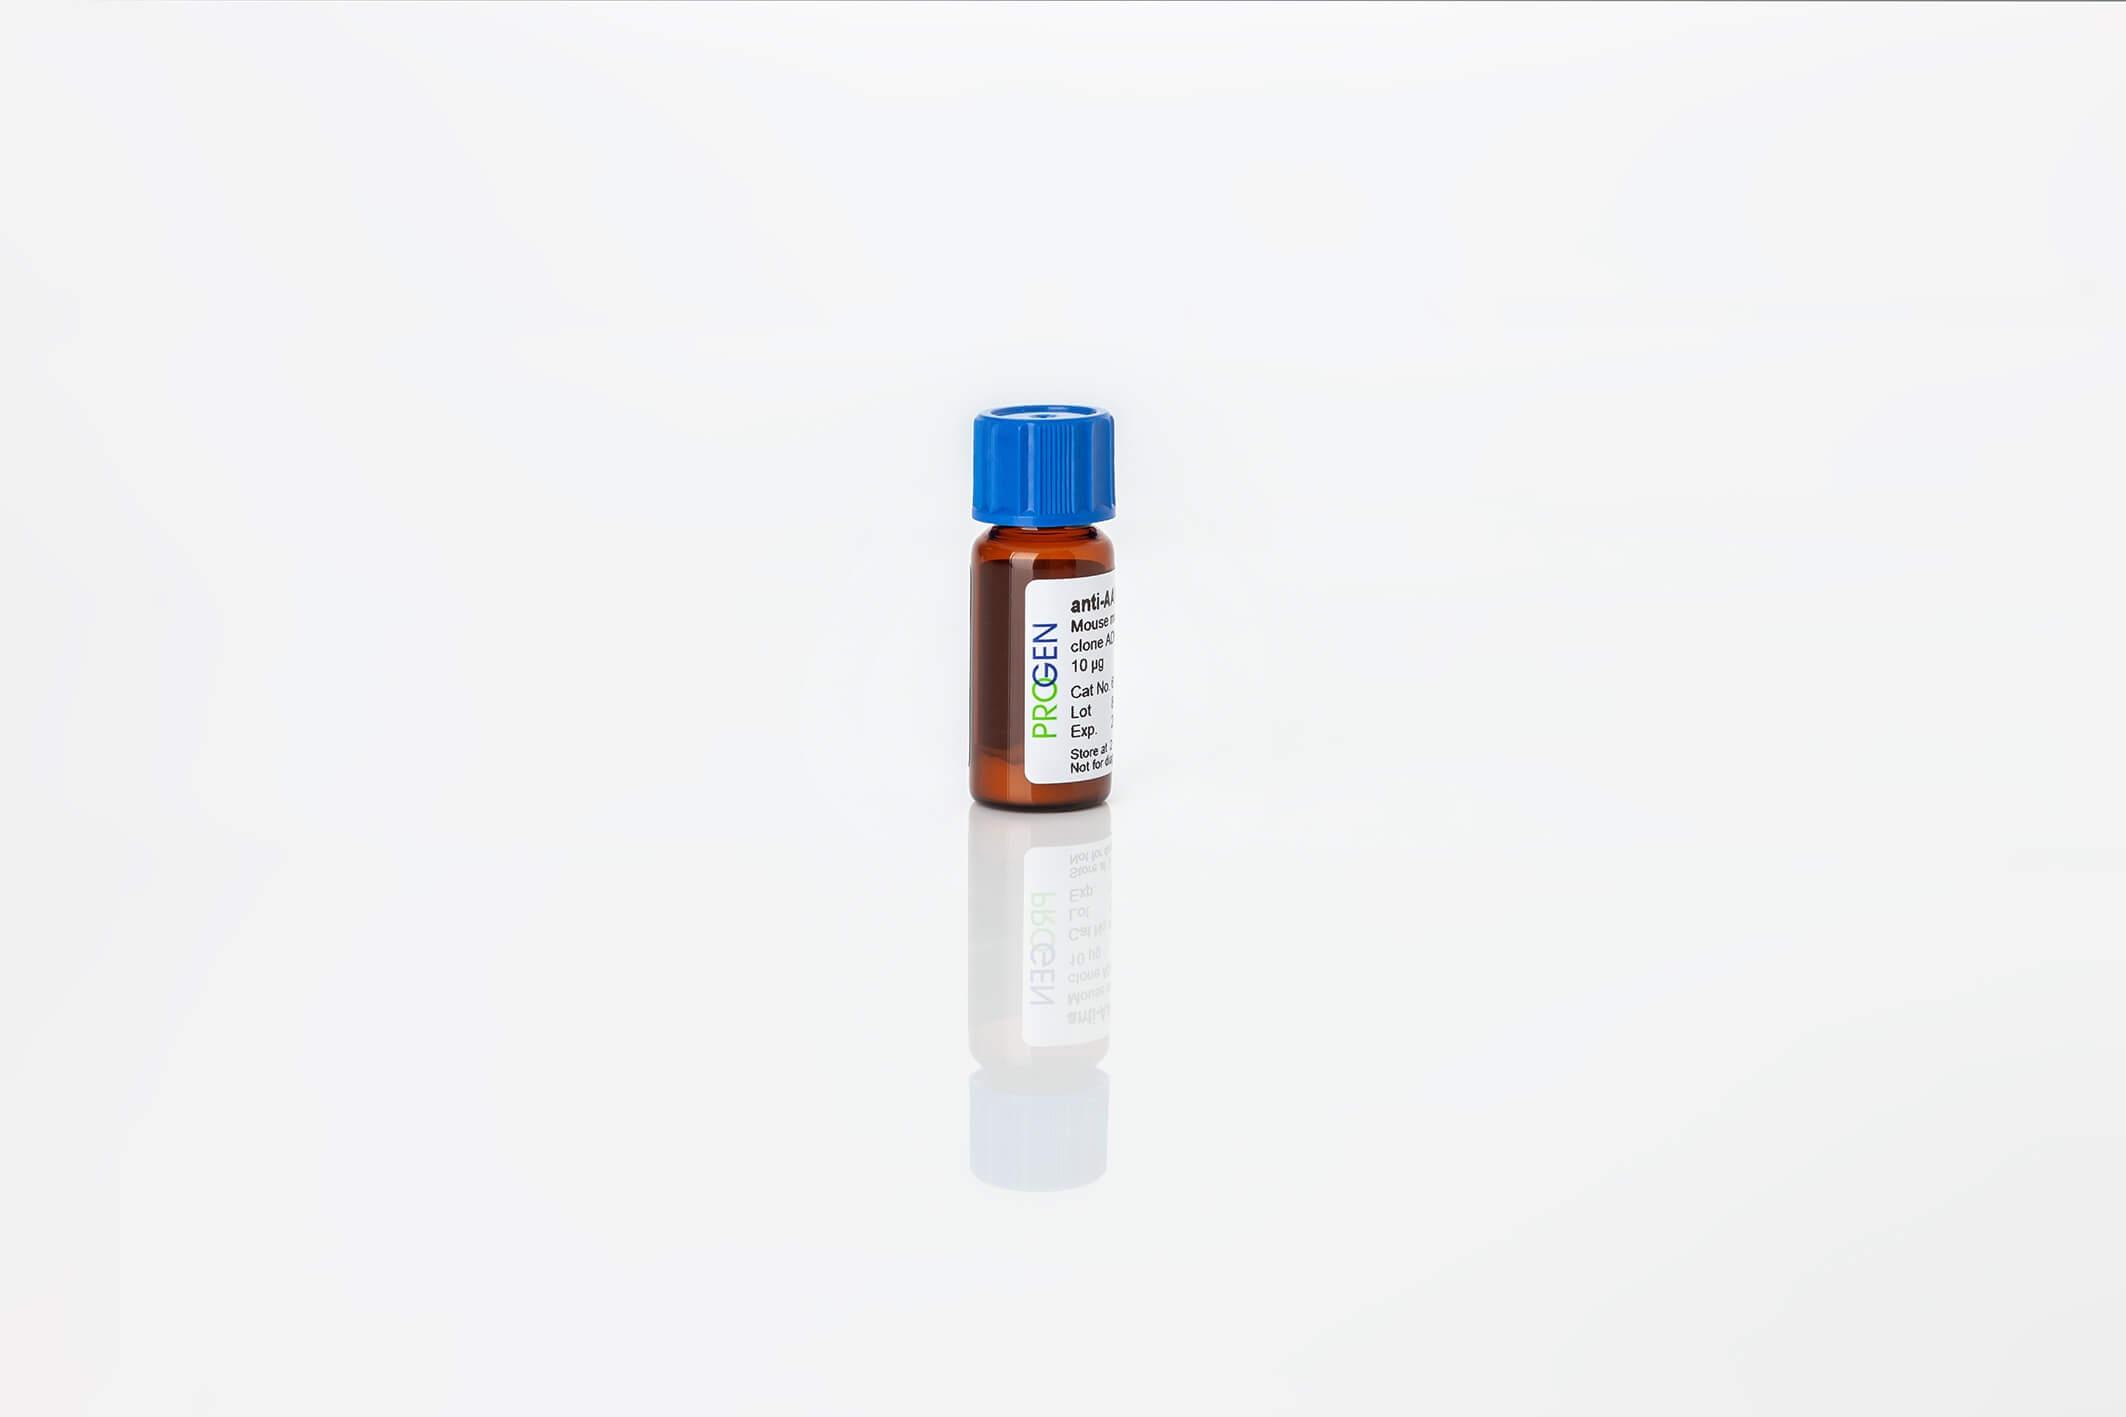 anti-human IgE mouse monoclonal, MH25-1, purified